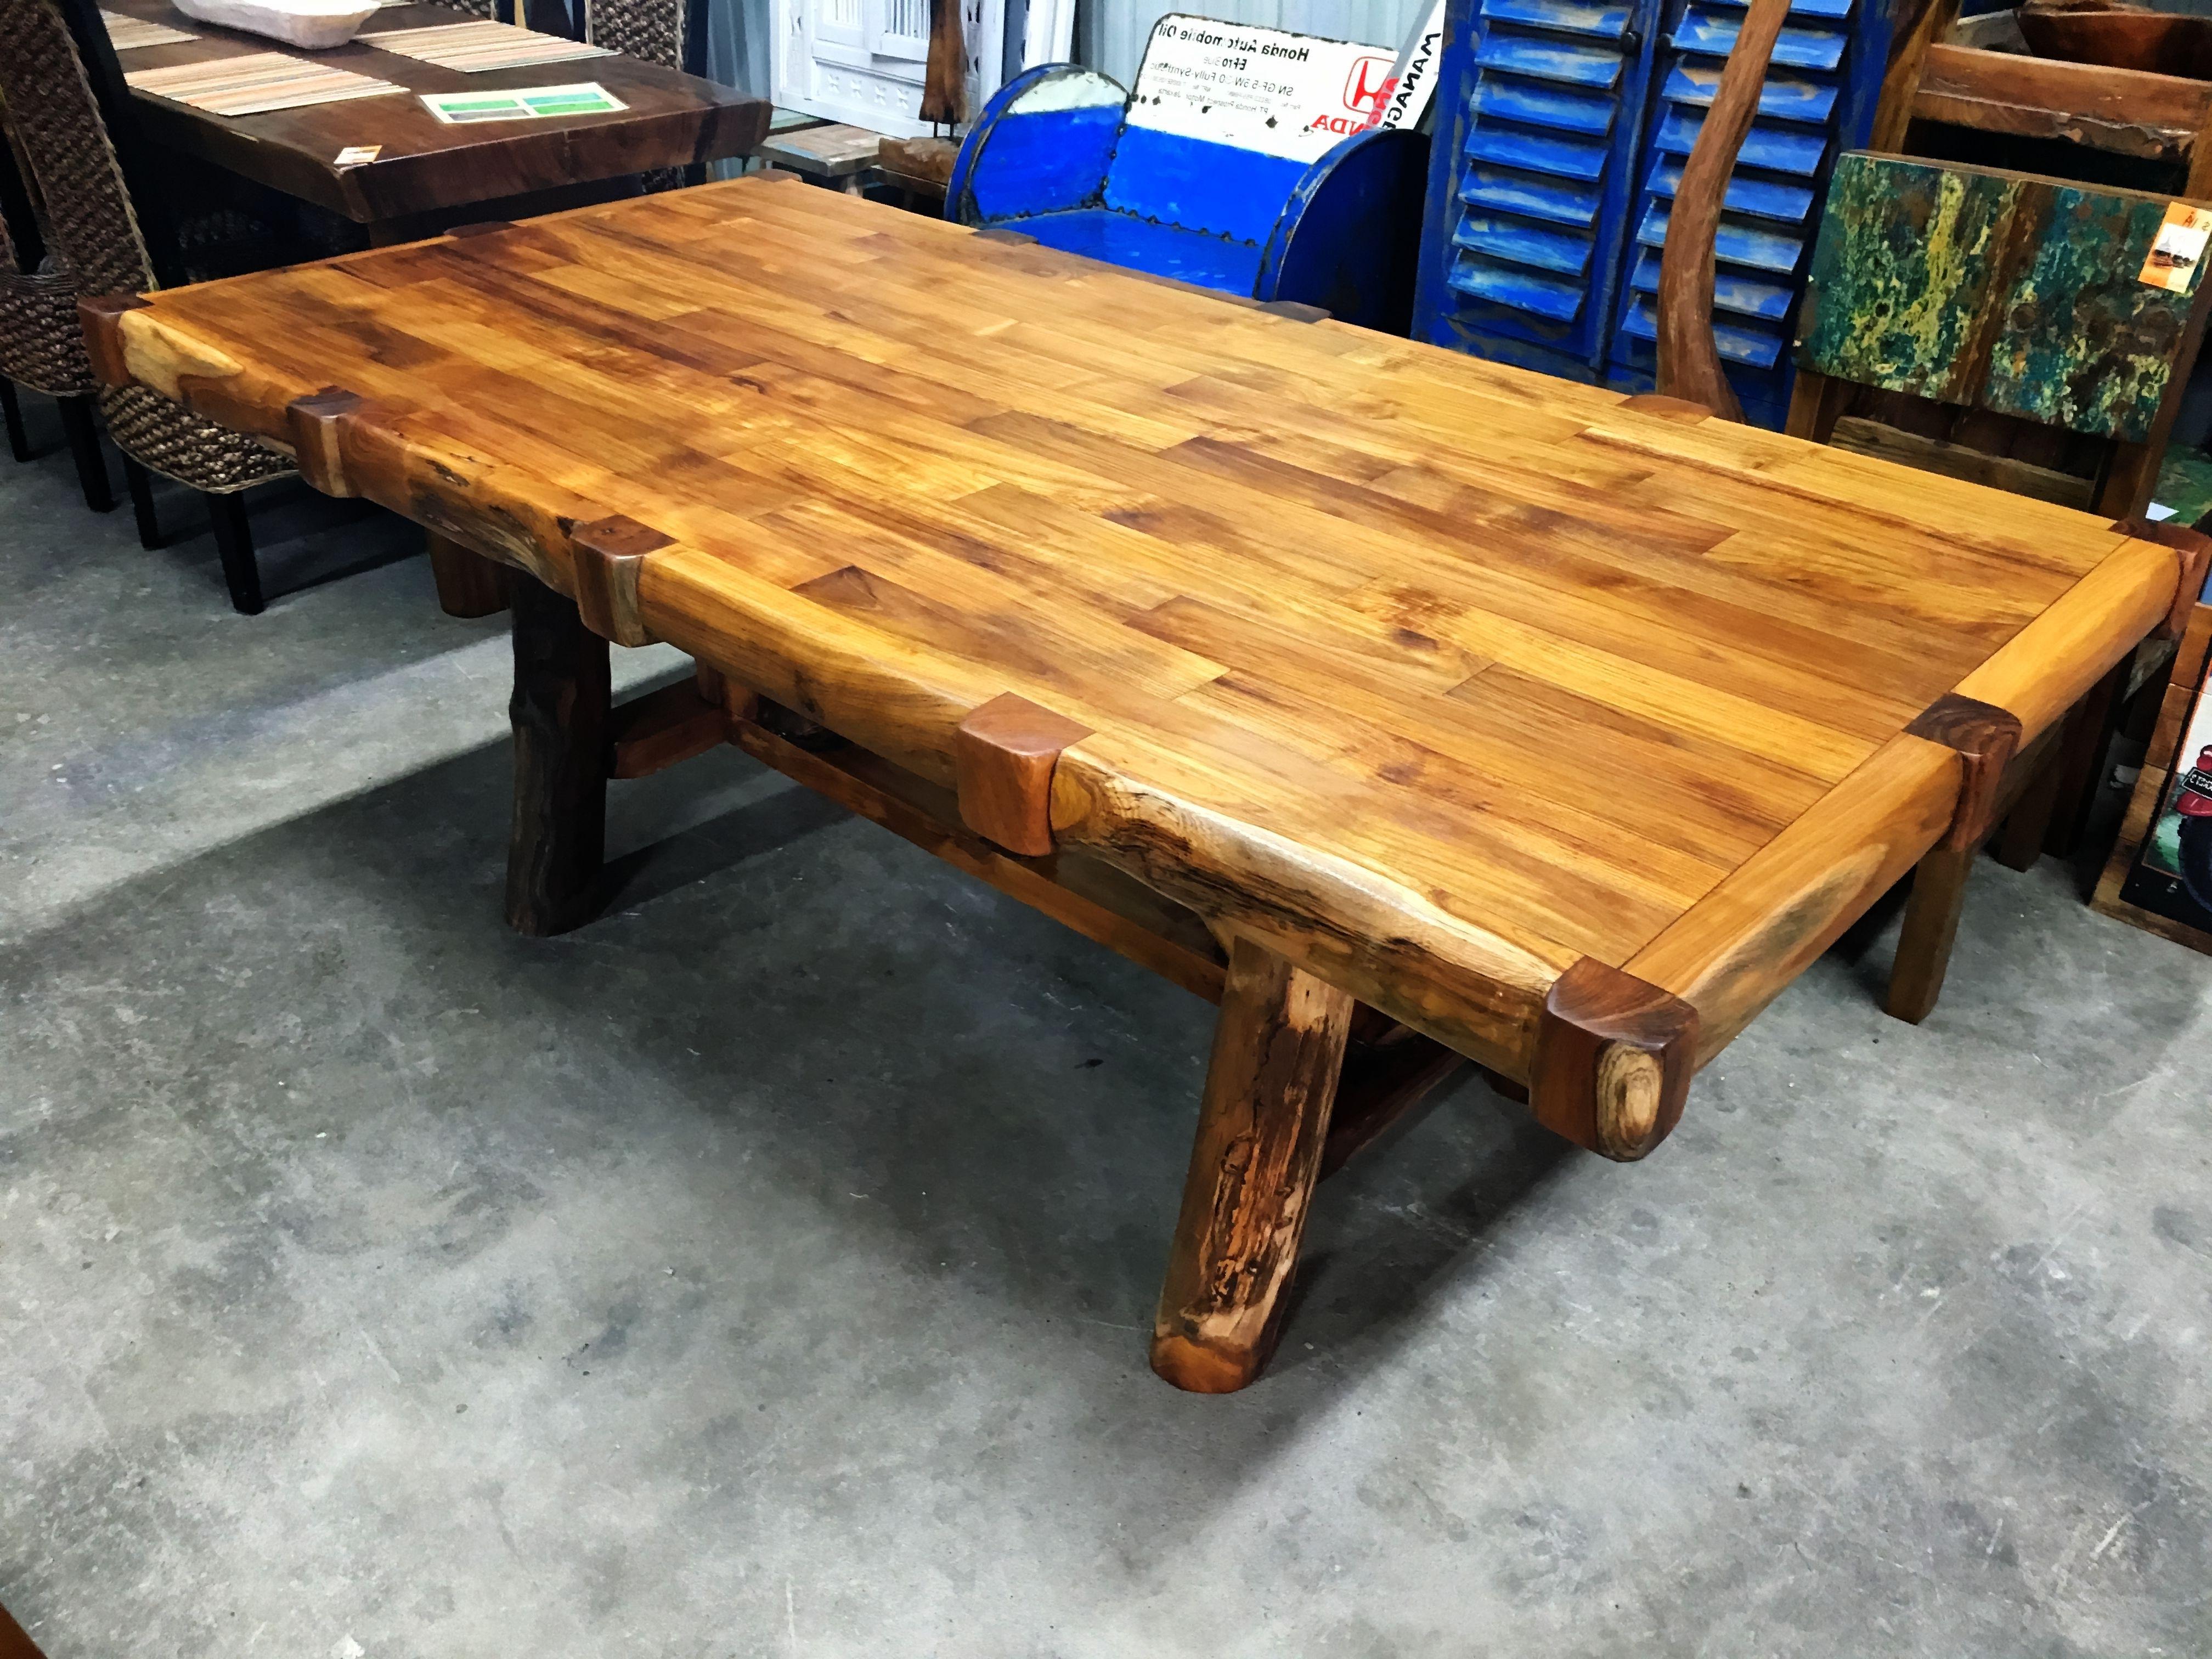 Parquet 7 Piece Dining Sets Regarding Recent Solid Teak Parquet Dining Table – Branch Style Legs (View 15 of 25)